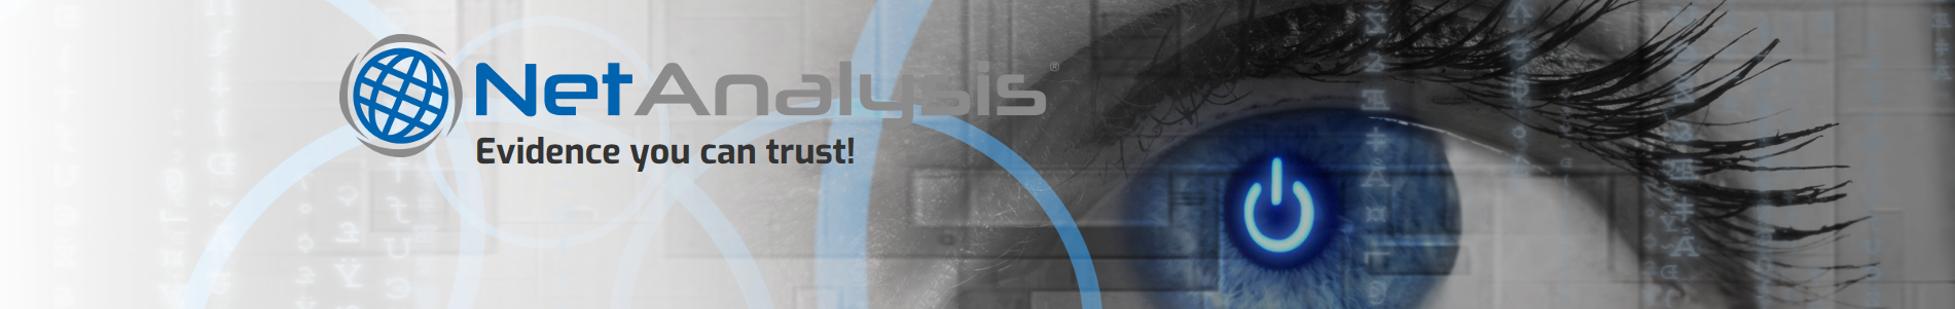 Digital Detective NetAnalysis Eye Banner showing Evidence You Can Trust